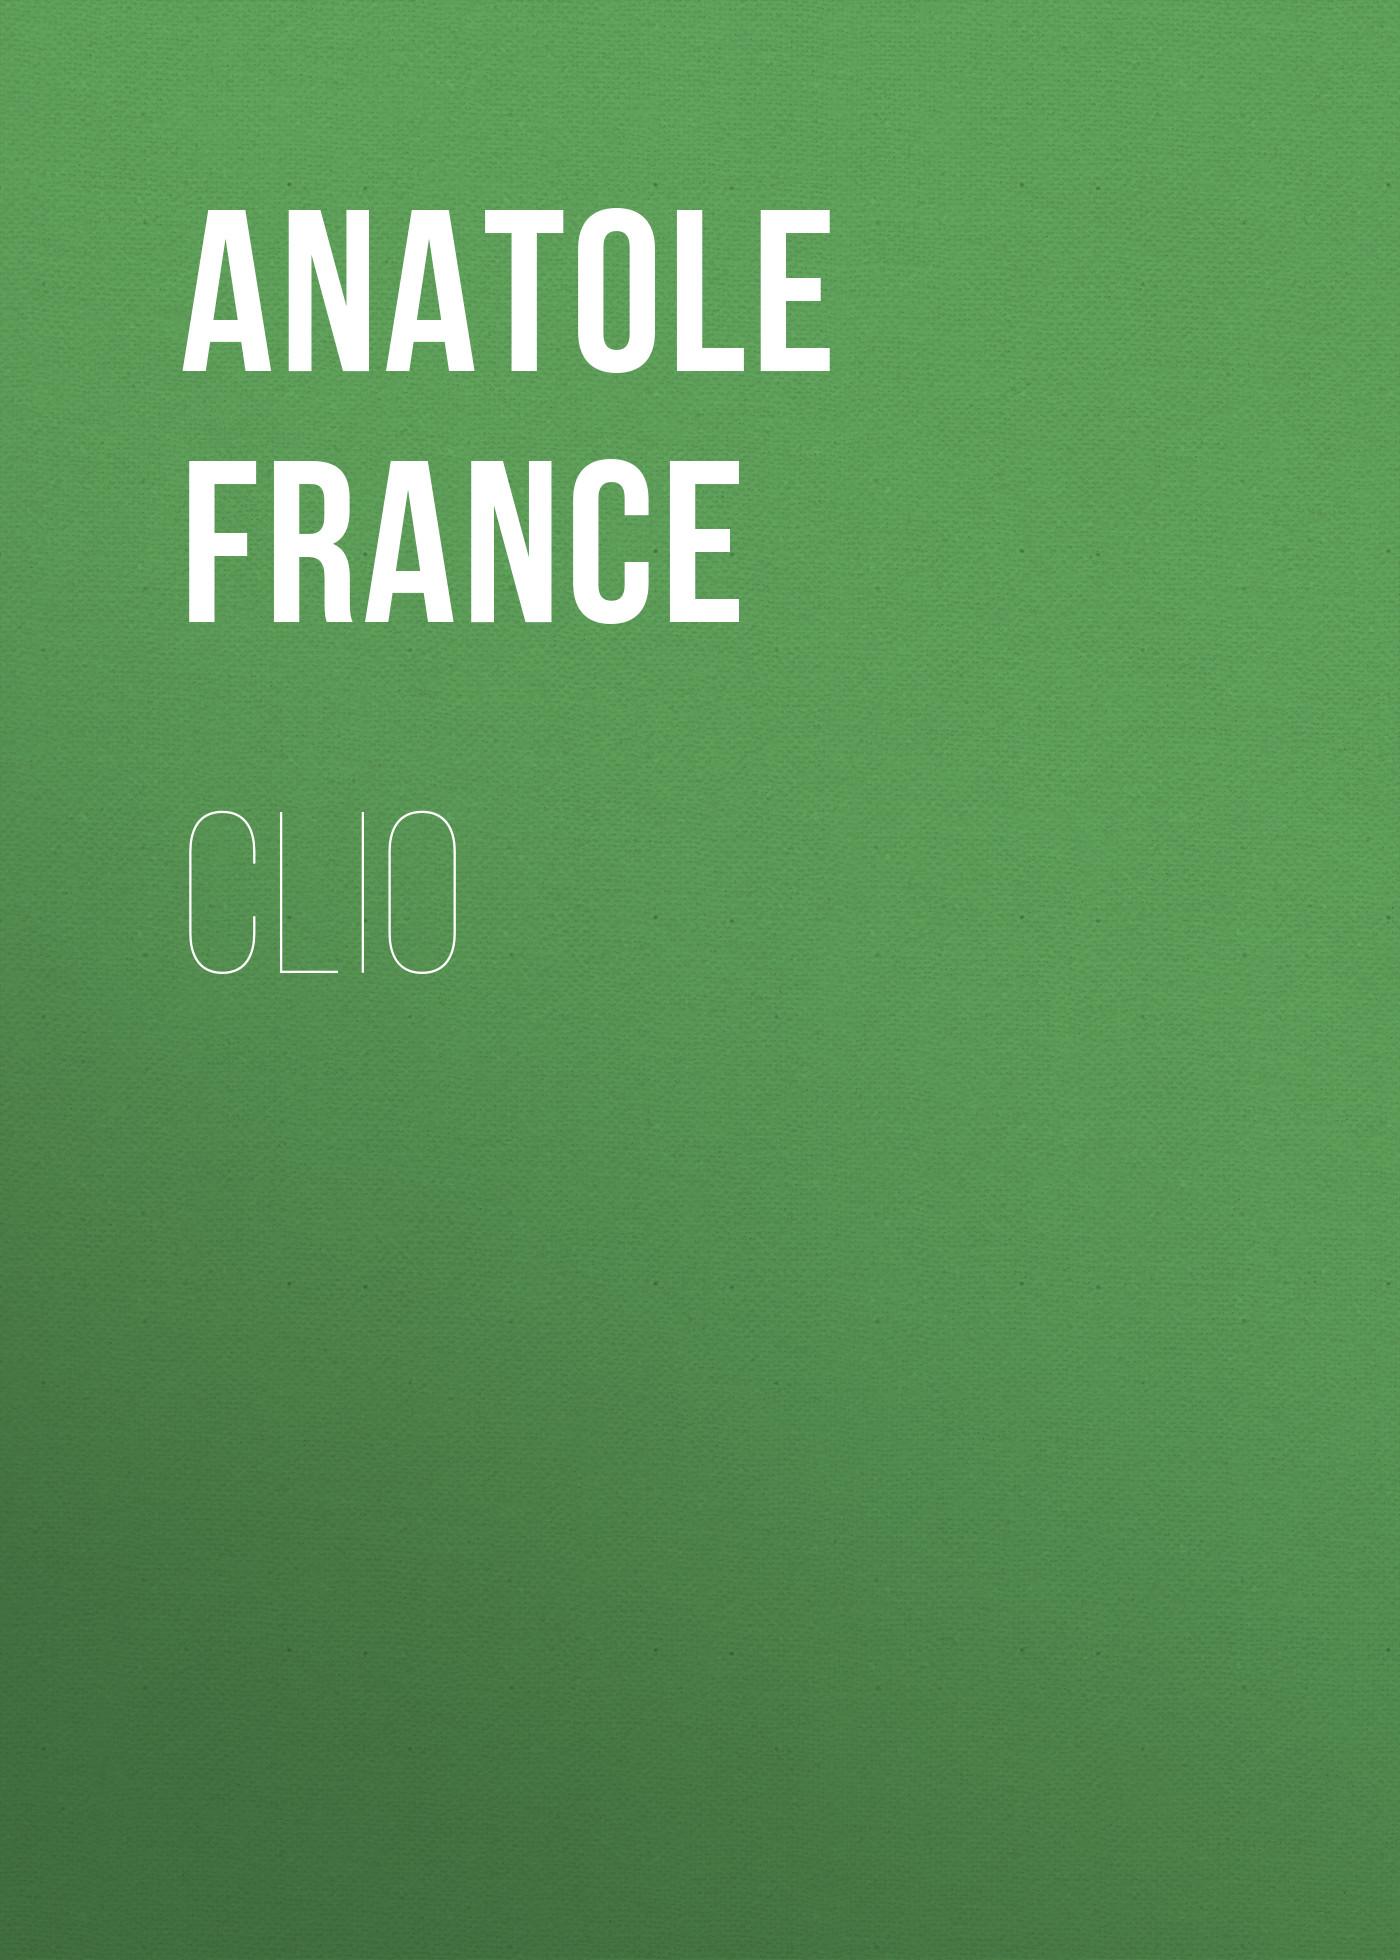 Anatole France Clio anatole france the white stone